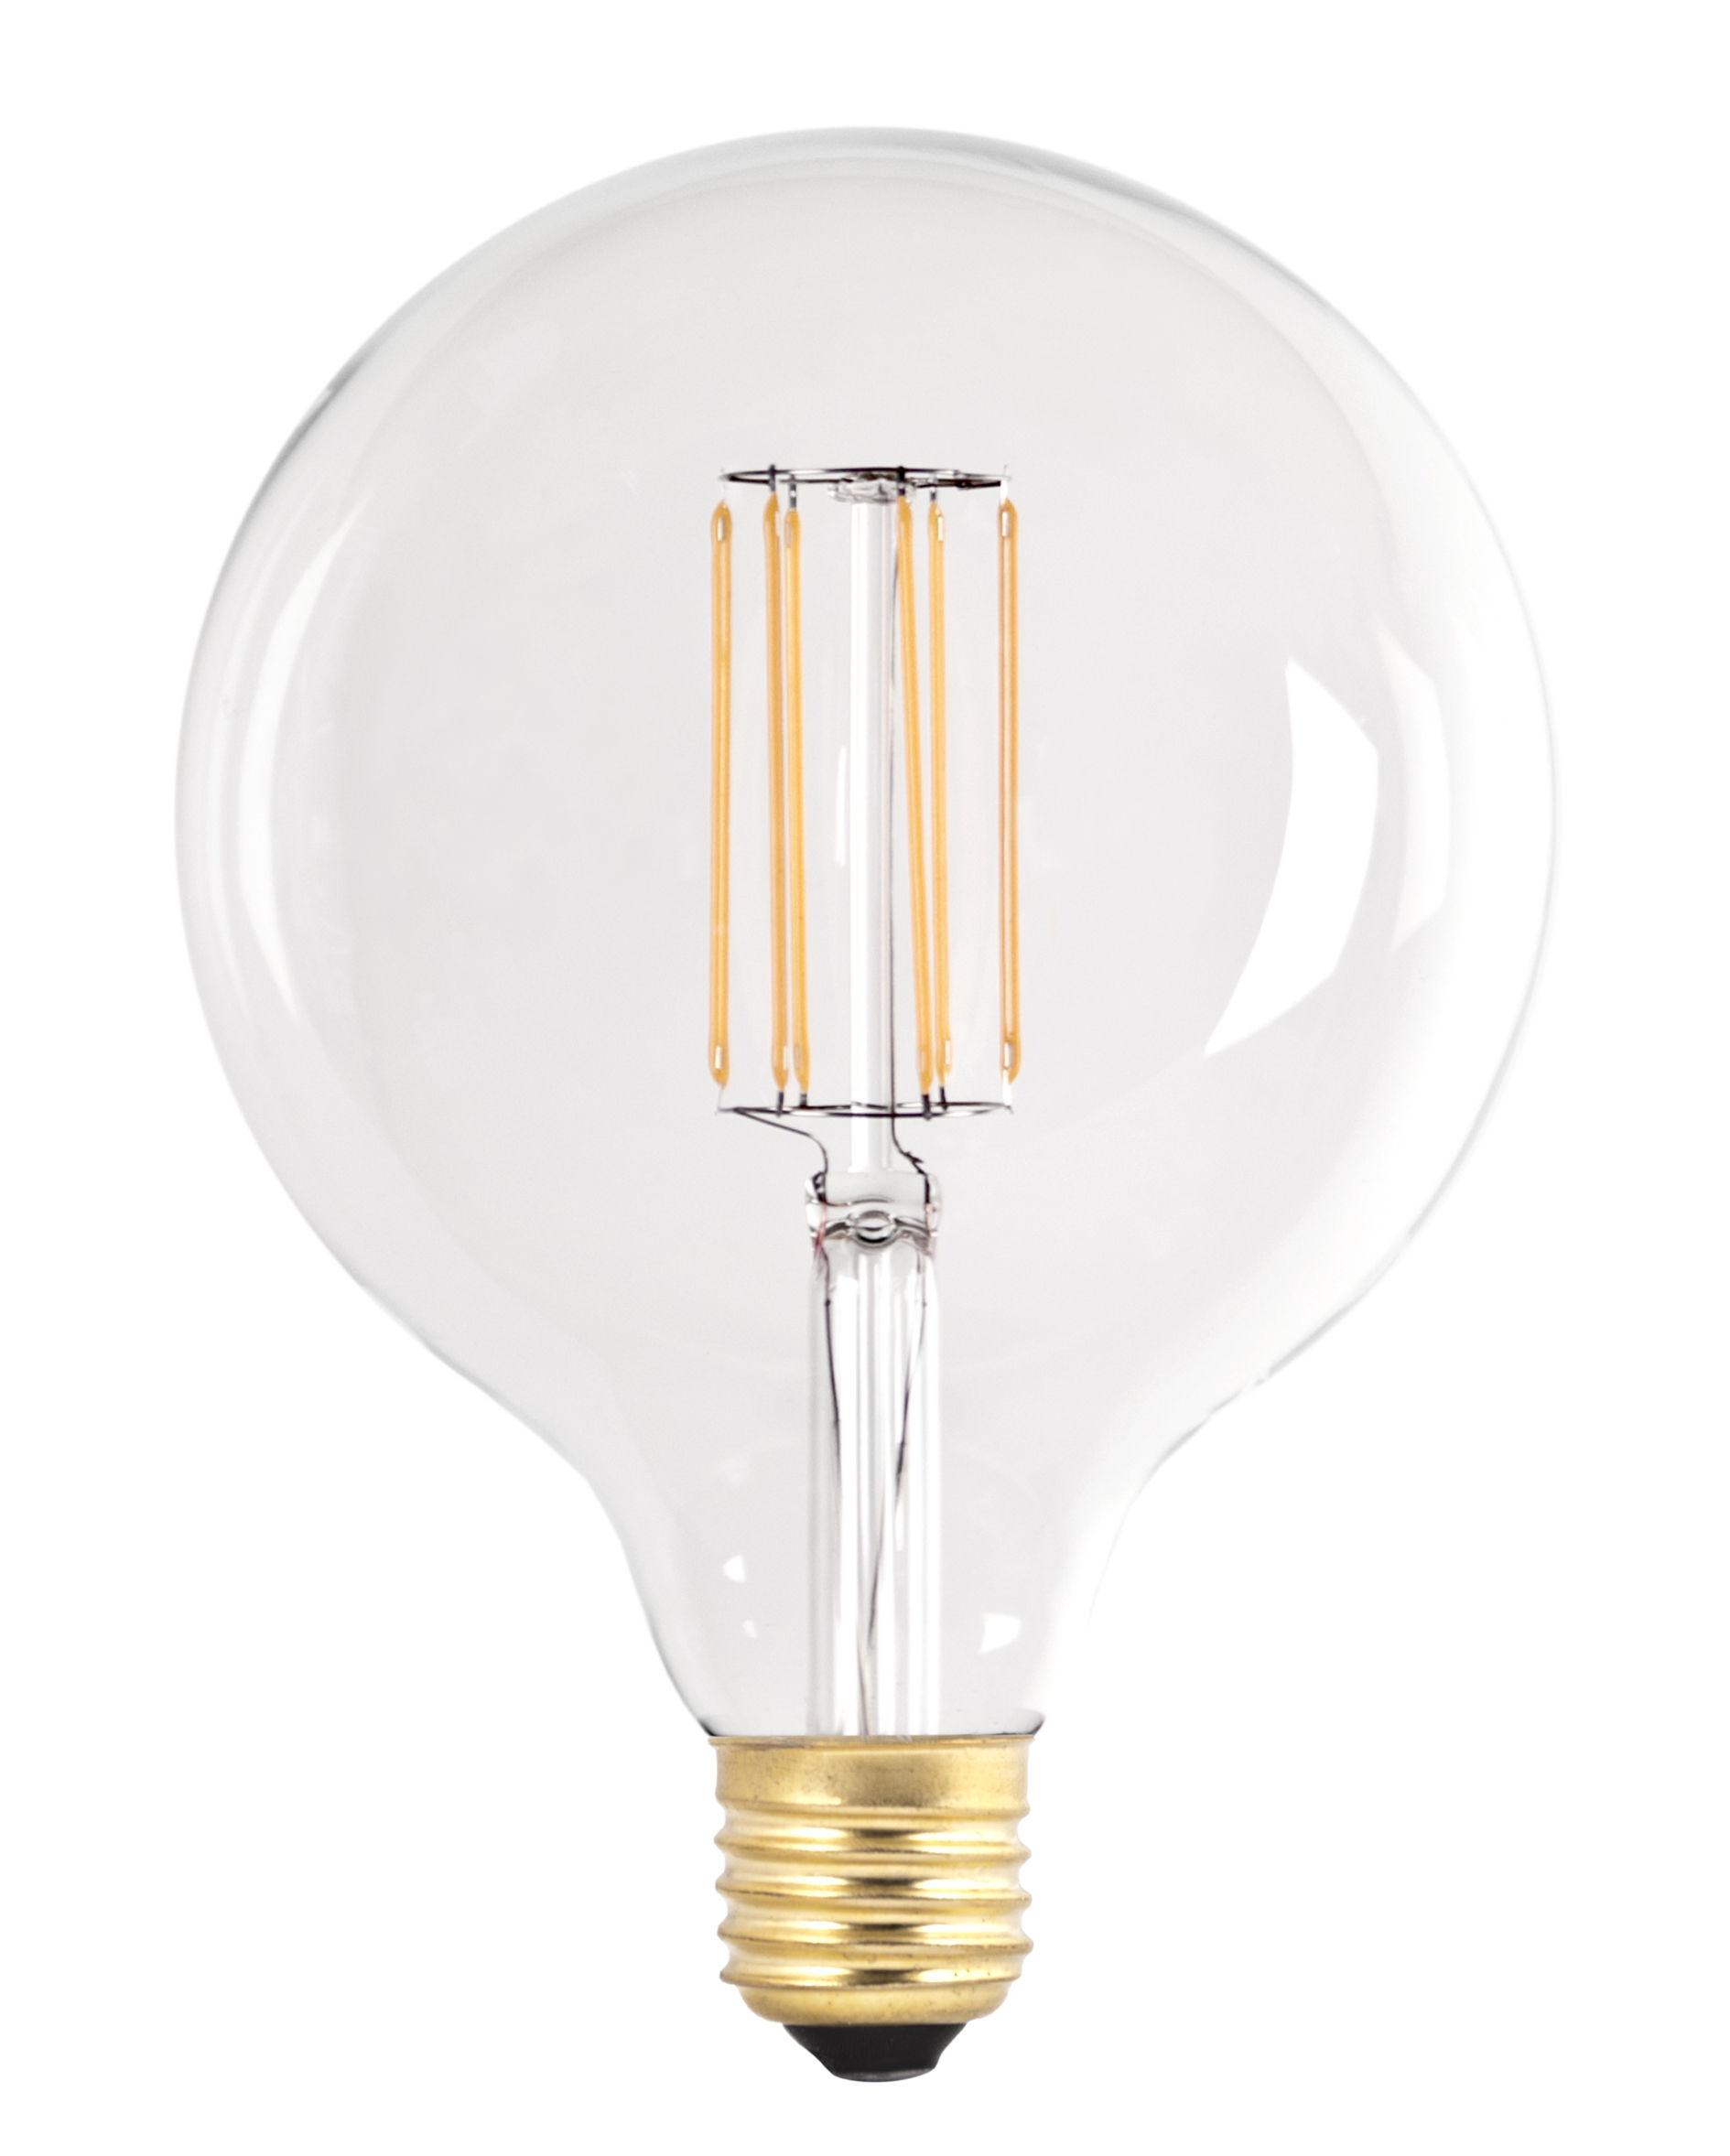 ampoule led g125 a filament 6w transparent or pop corn. Black Bedroom Furniture Sets. Home Design Ideas